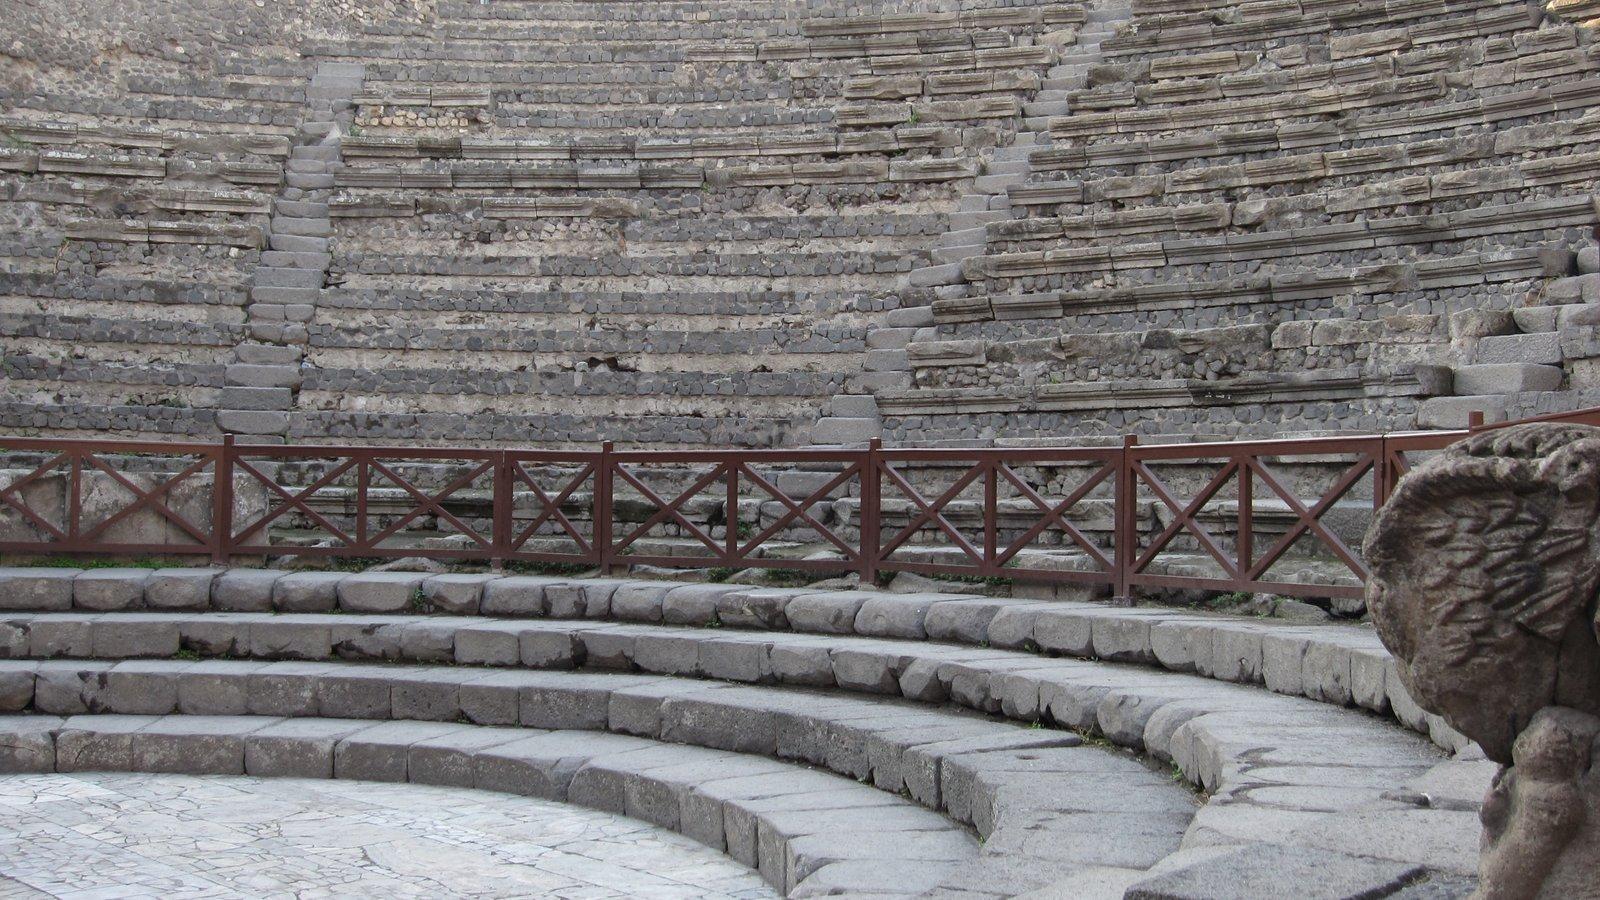 Mount Vesuvius - Pompei which includes heritage elements, a ruin and theater scenes